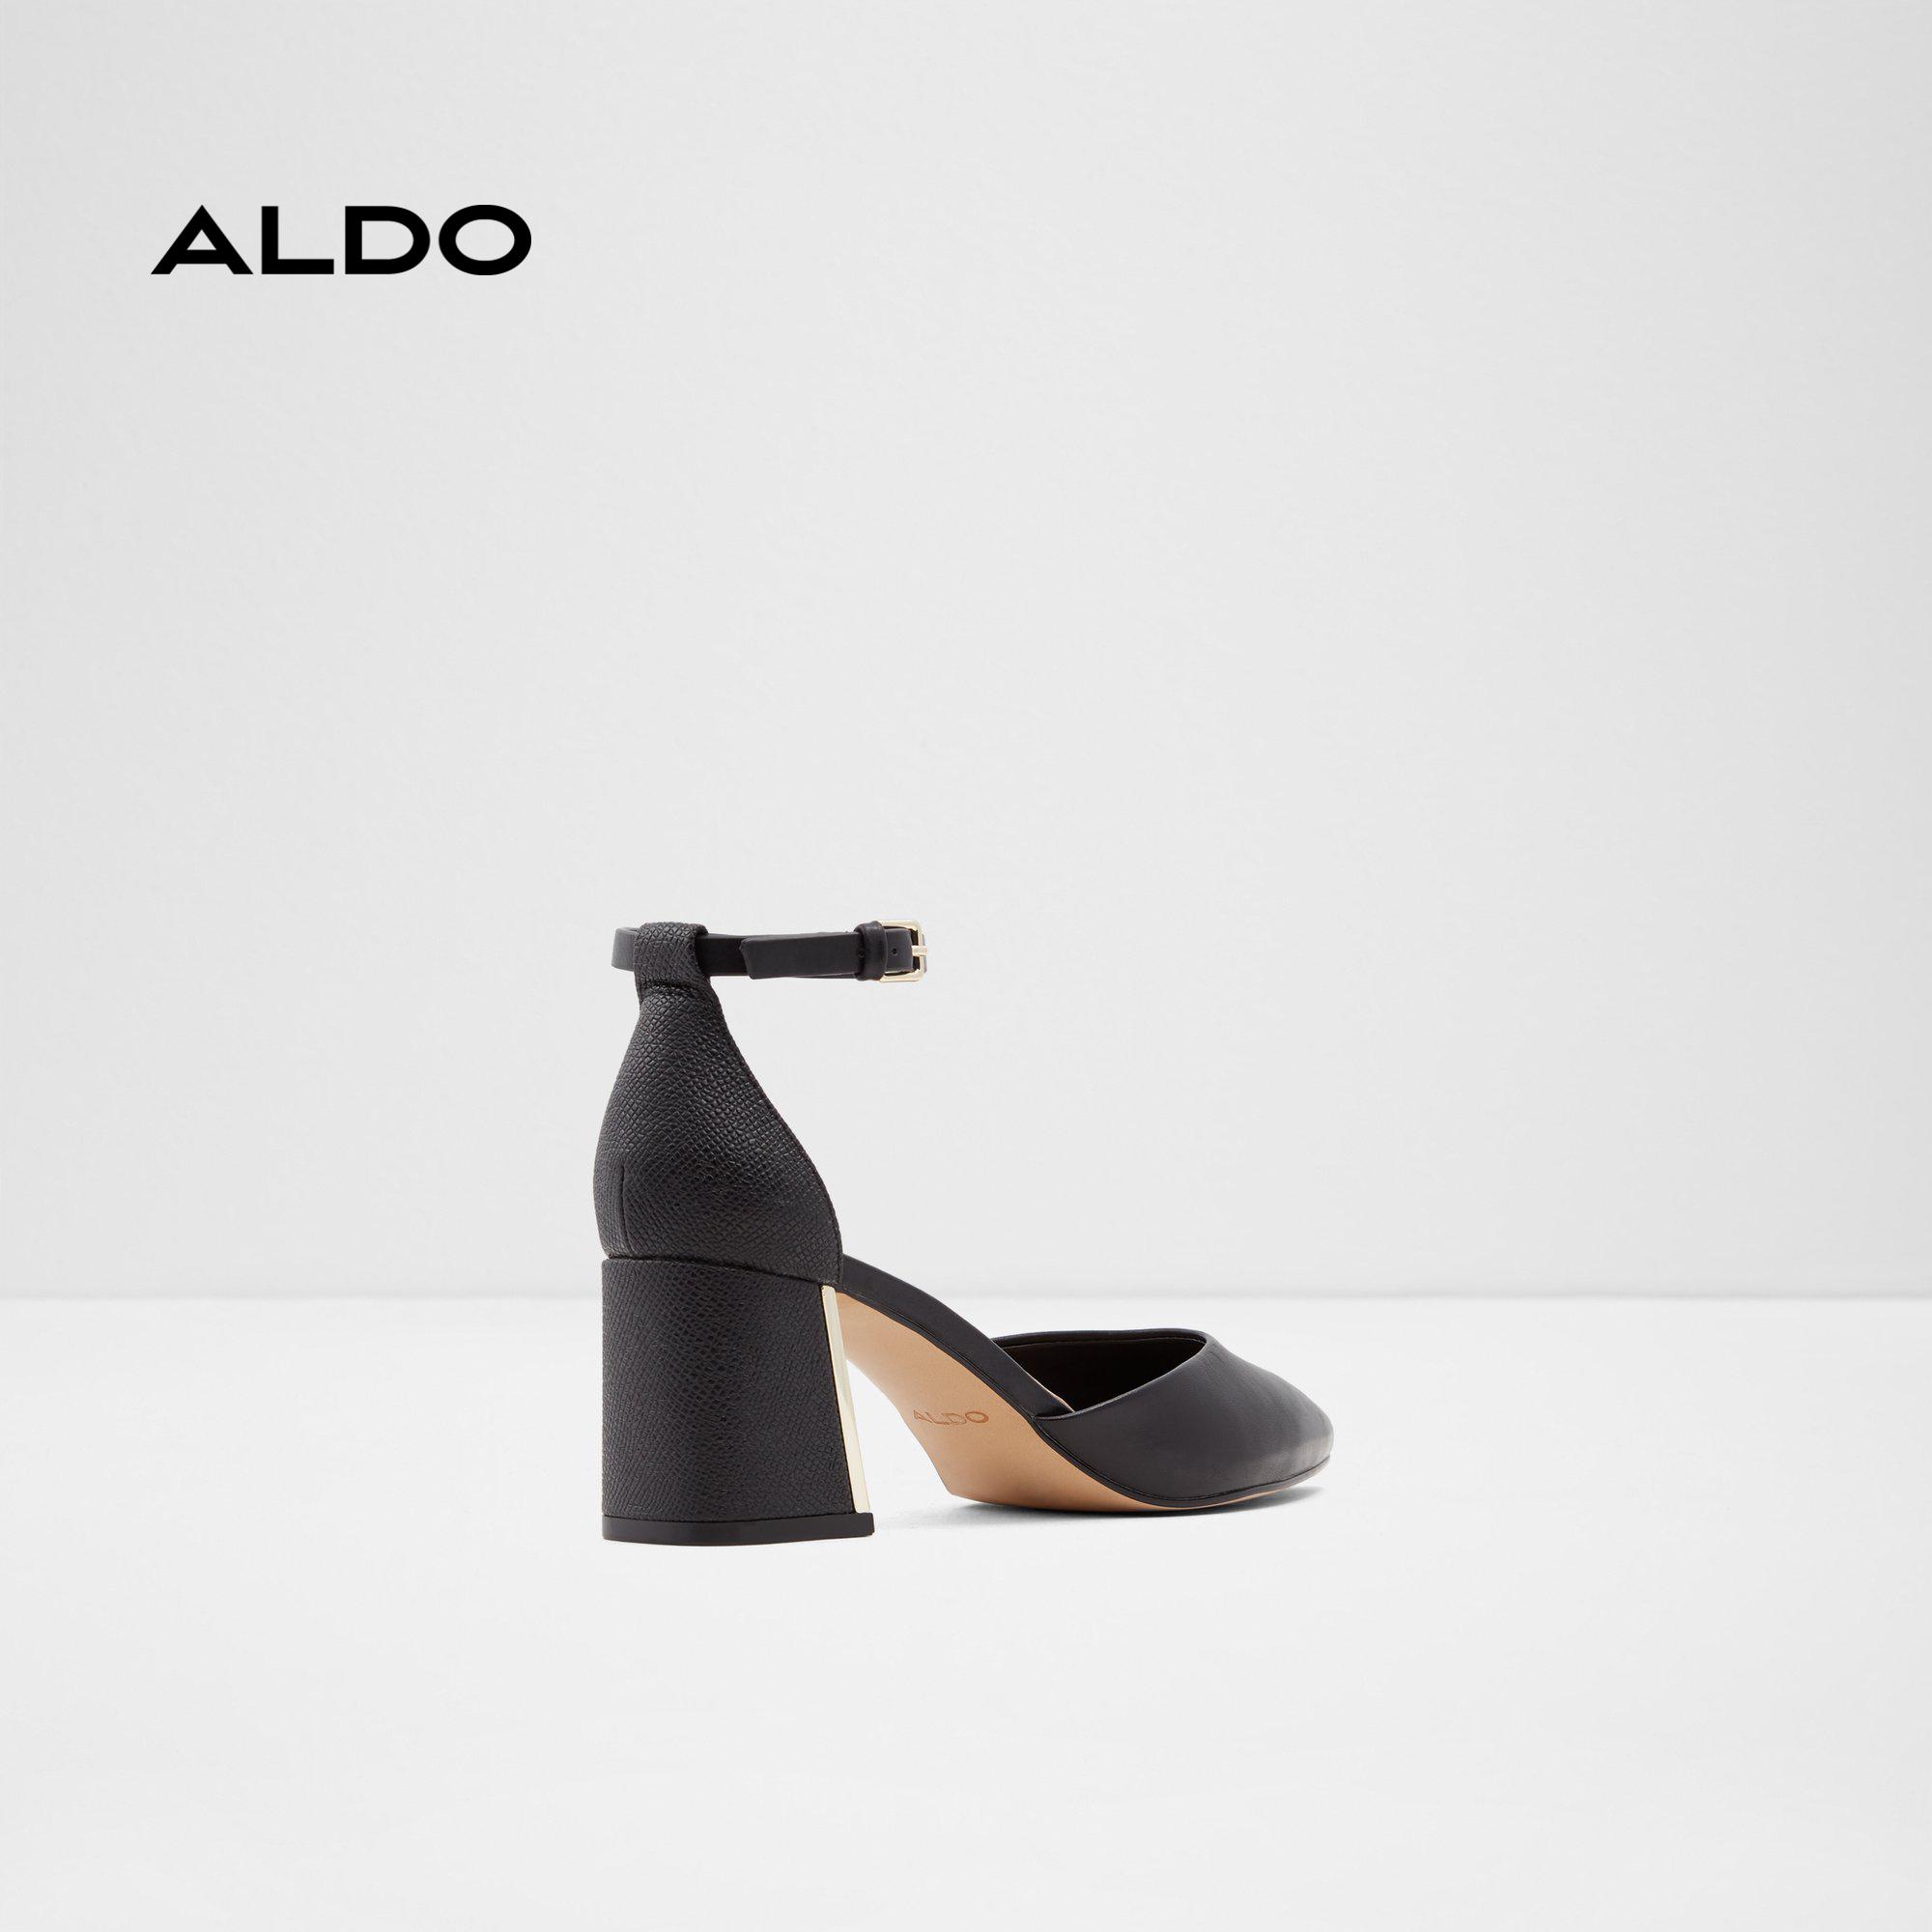 Giày cao gót nữ gót vuông ALDO GRYMA